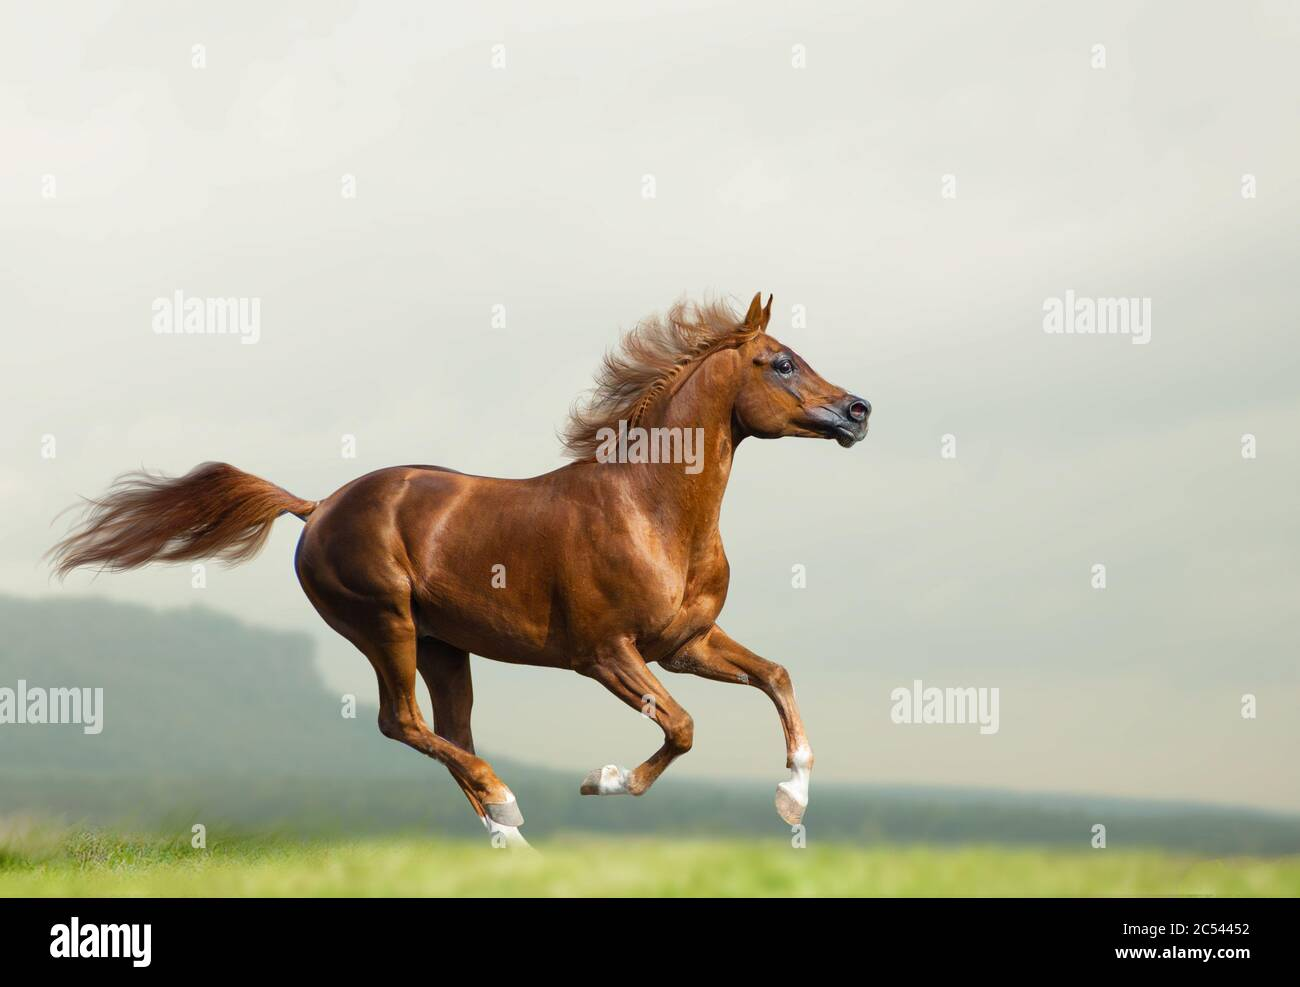 Beautiful Chestnut Arabian Stallion Running Wild Chestnut Arabian Horse On Freedom Runs Gallop Fast Mountains And Fields On The Background Stock Photo Alamy